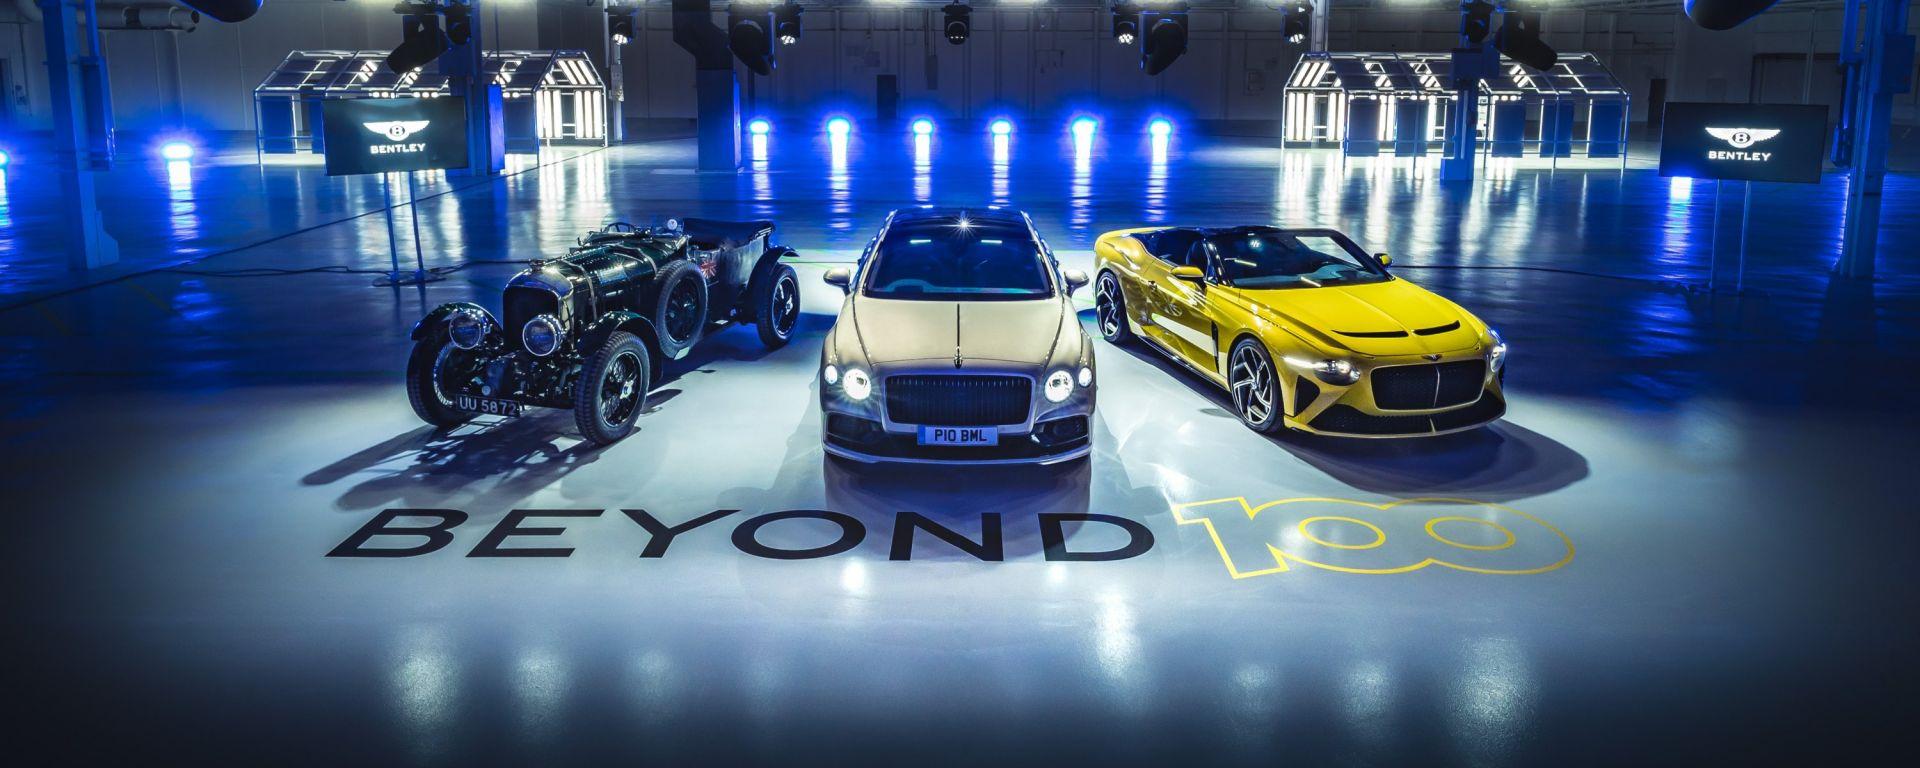 Beyond100, la strategia green di Bentley